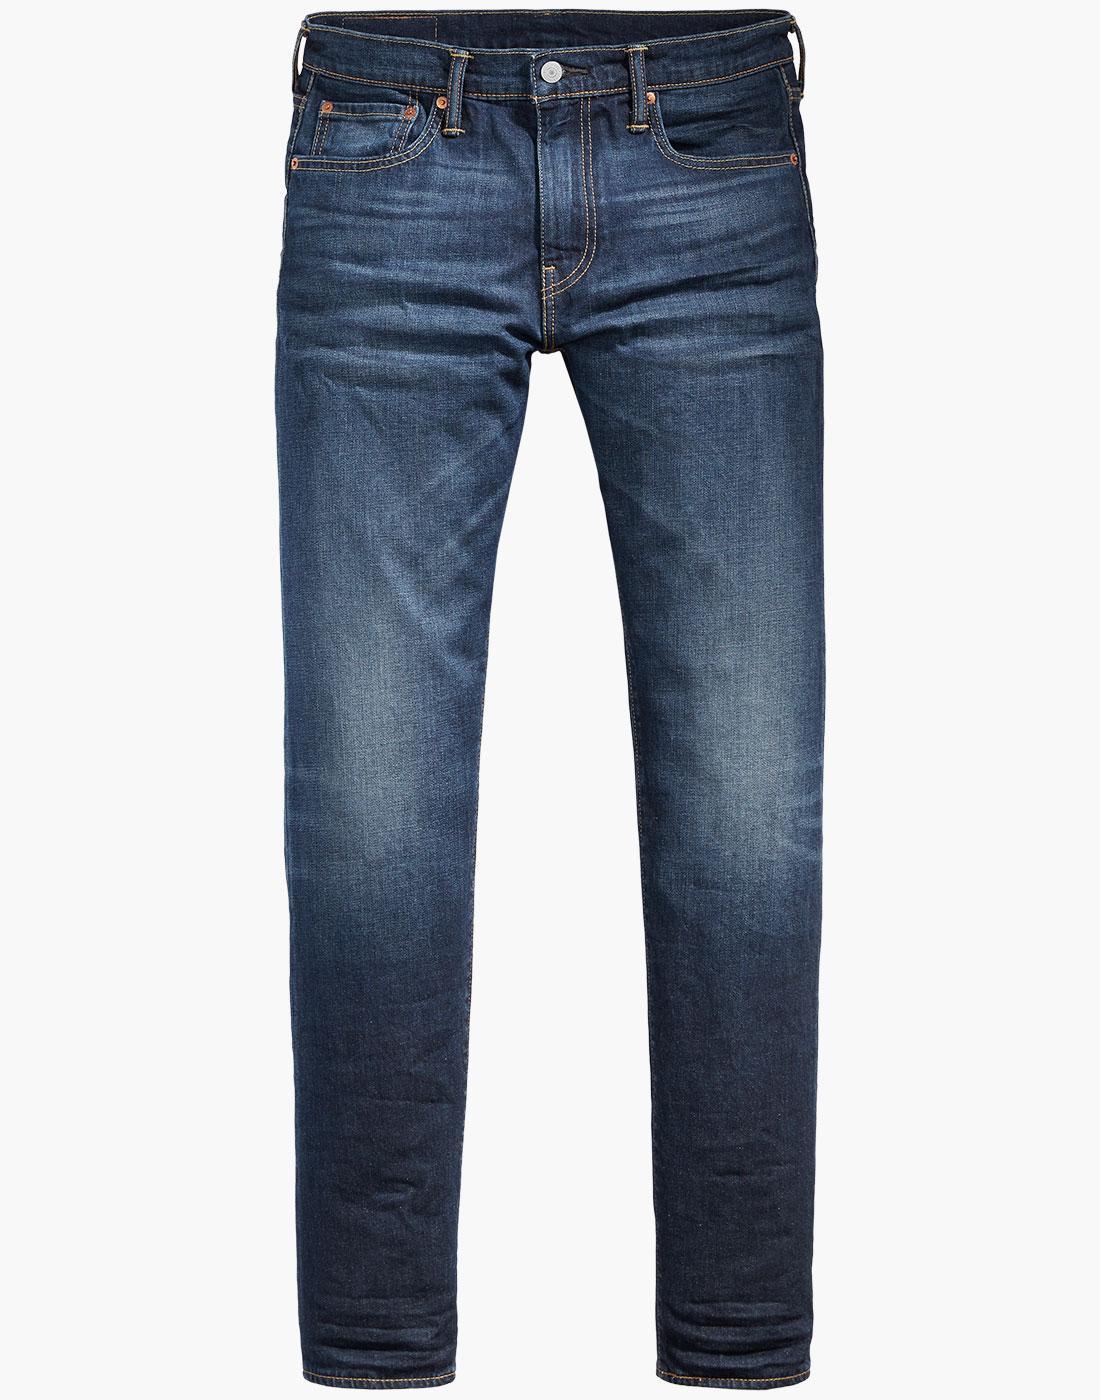 025ad1baa23 LEVI'S 502 Men's Retro Mod Regular Tapered Jeans in City Park